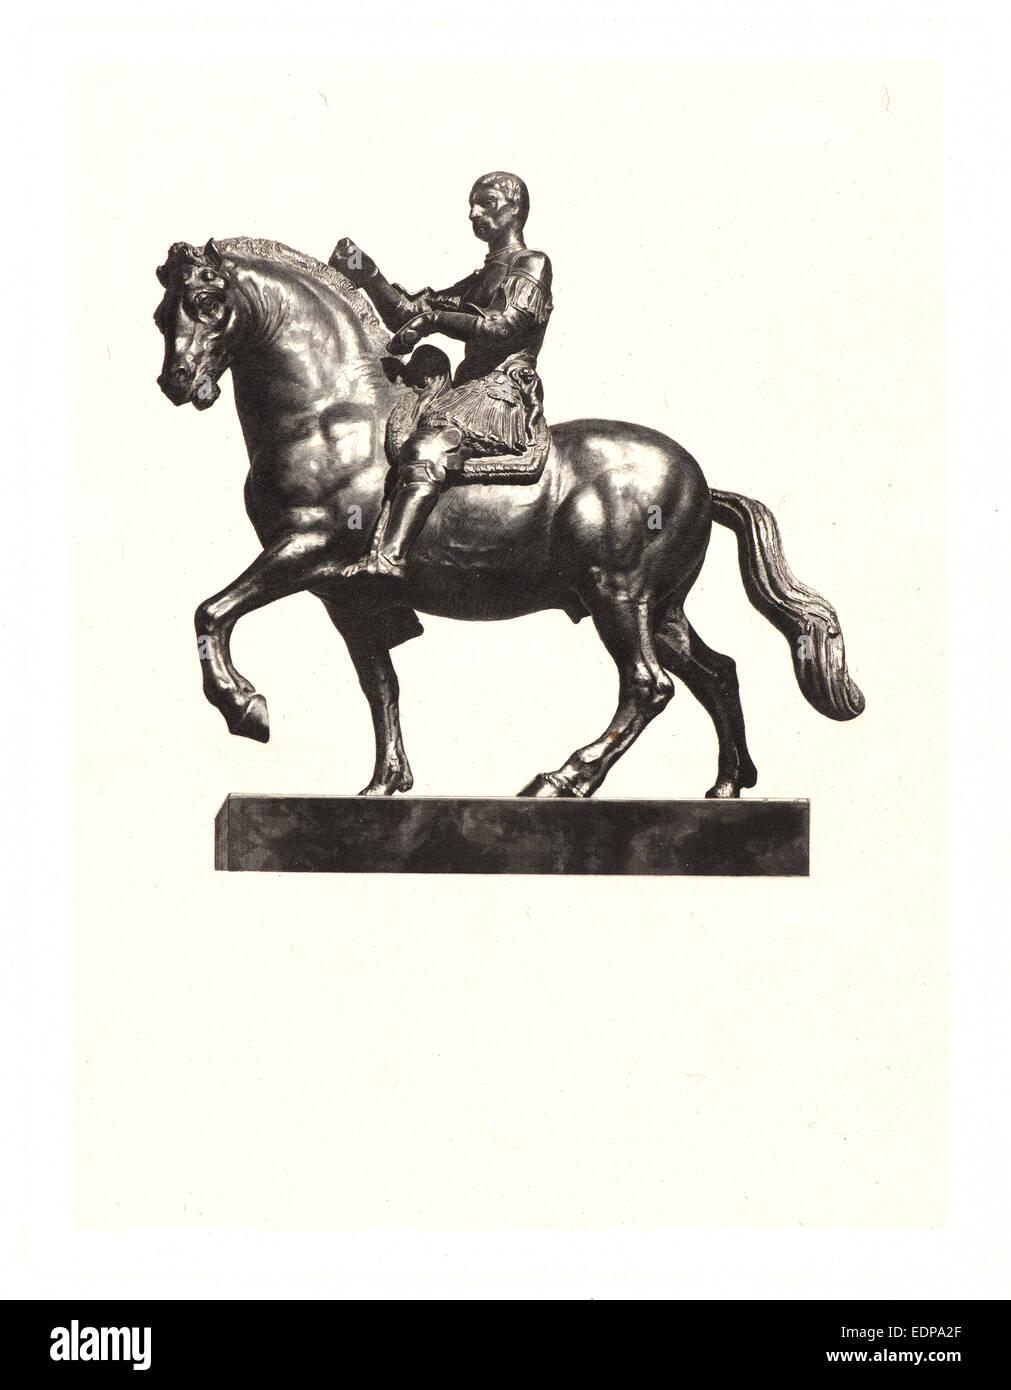 Claude-Ferdinand Gaillard (French, 1834 - 1887) after Donatello (Italian, ca. 1386 - 1466). Gattamelata, 19th century. - Stock Image